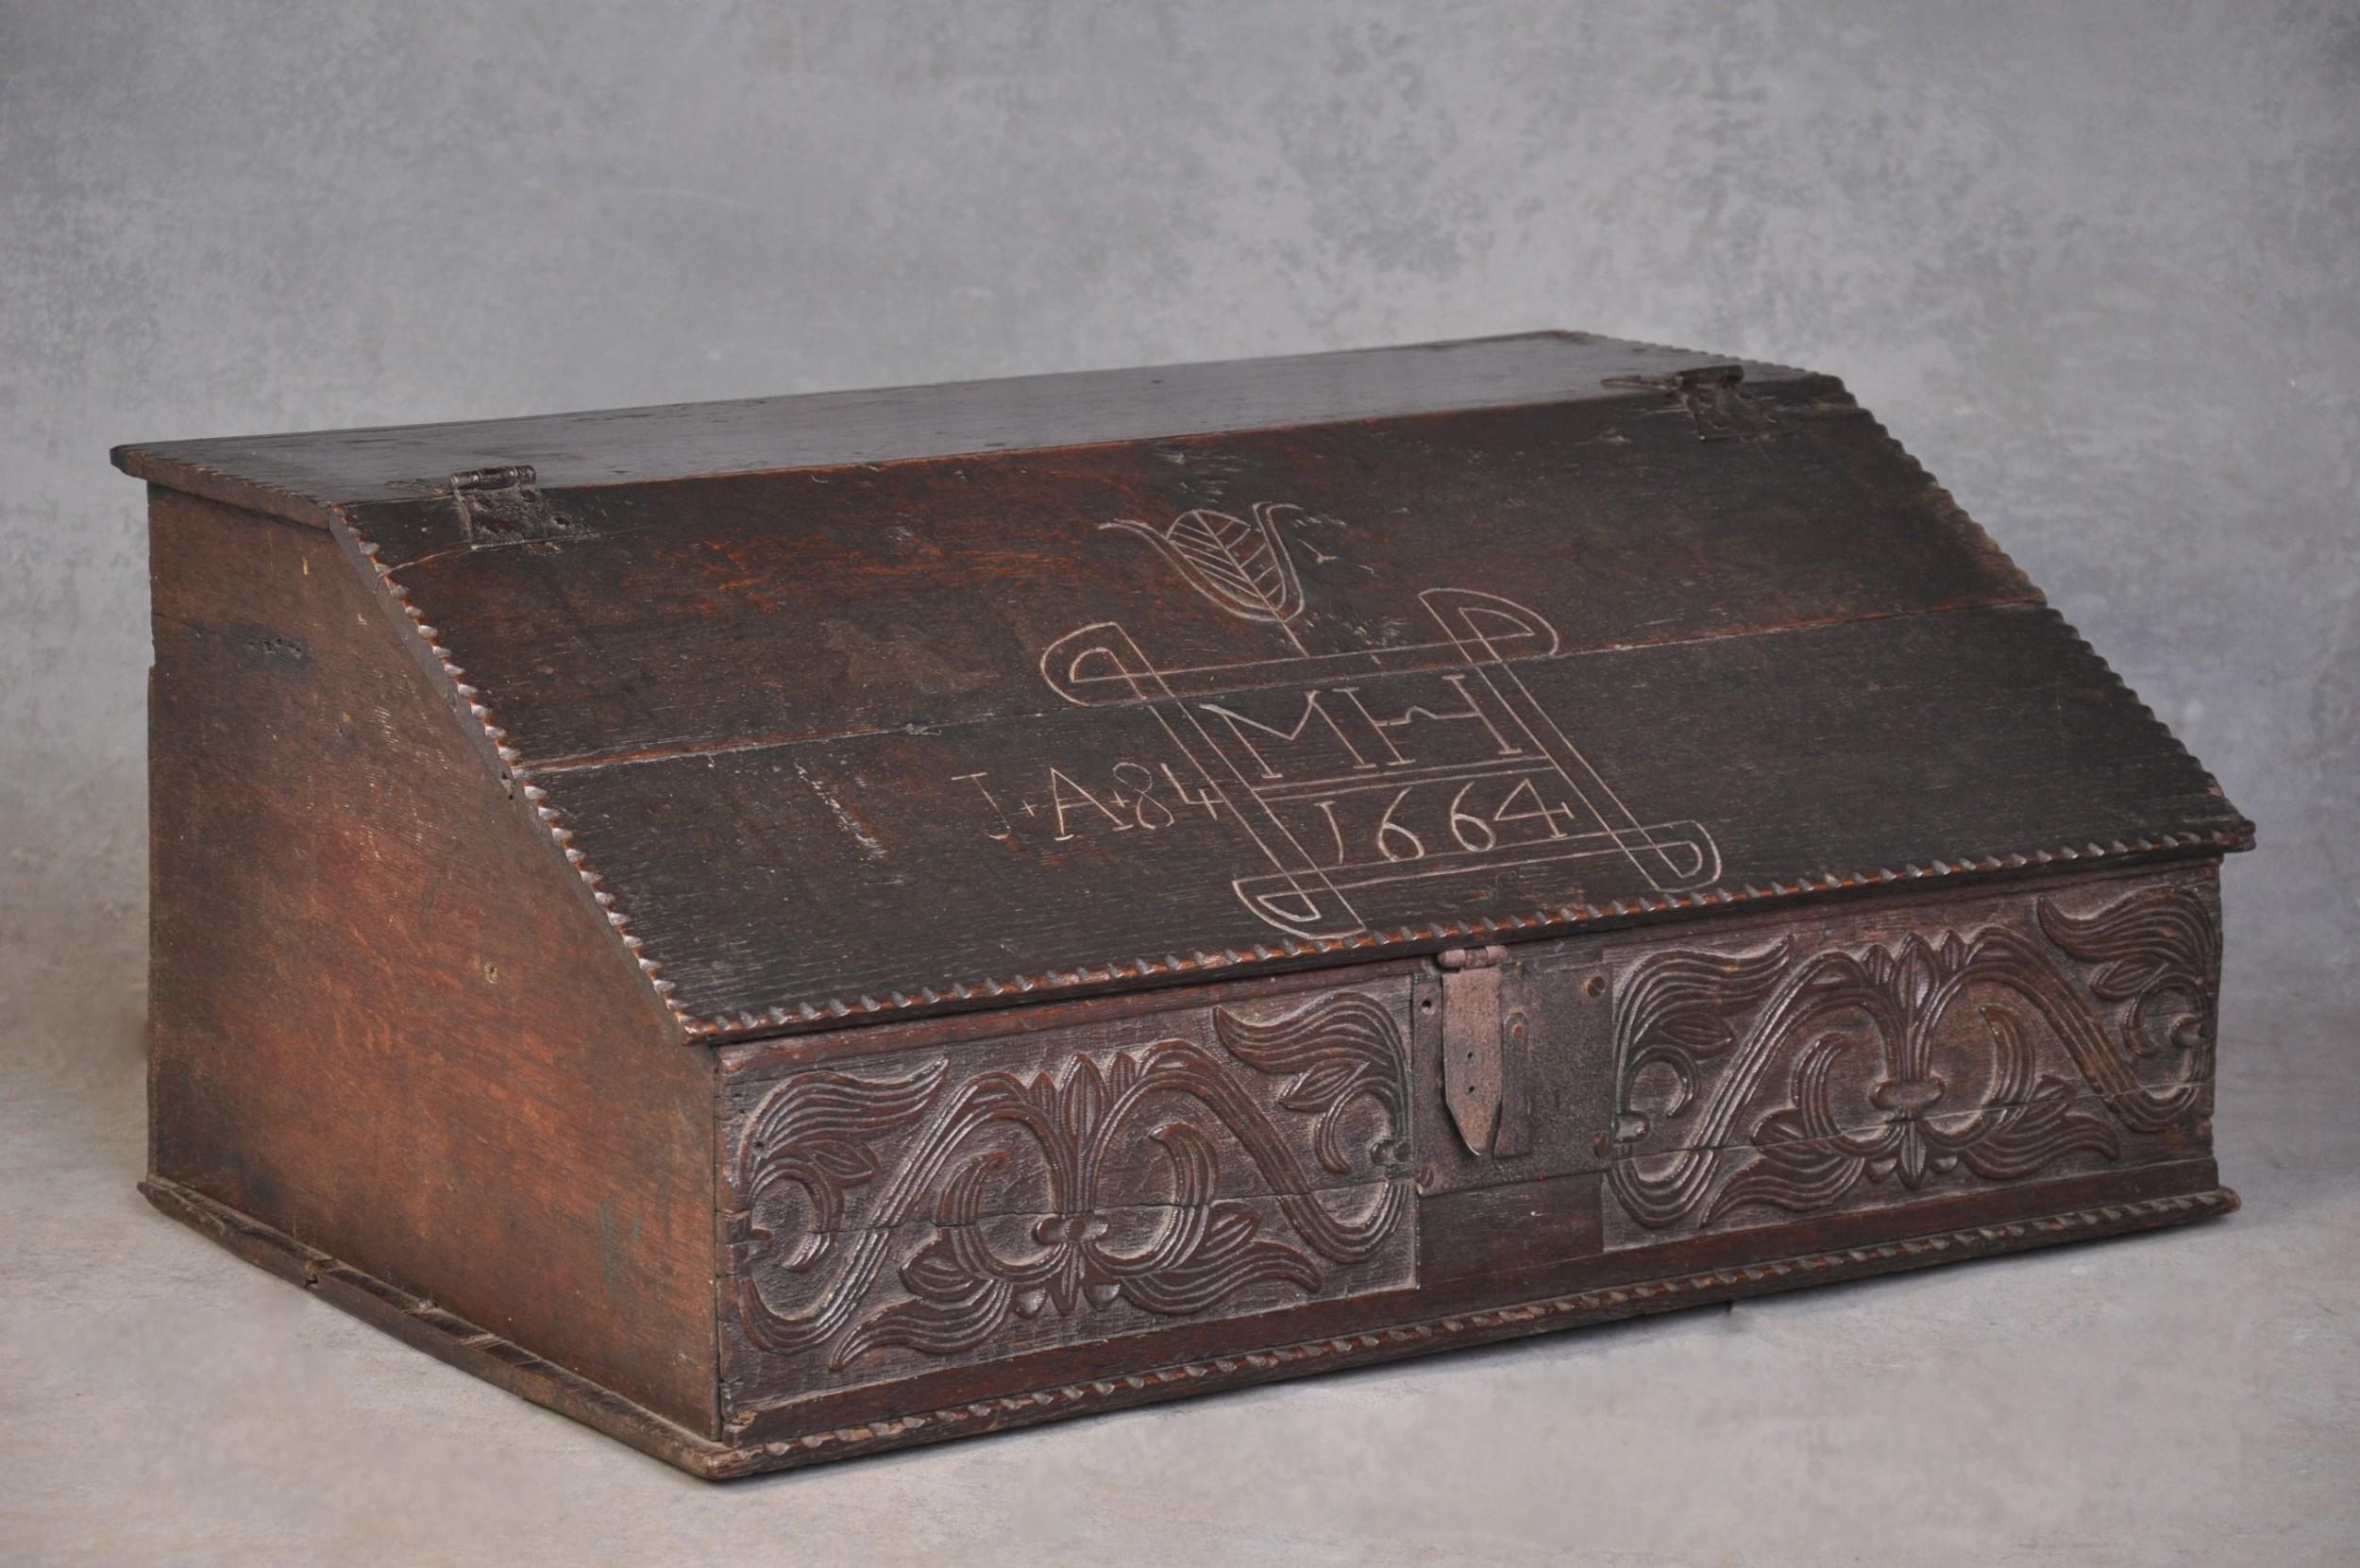 17th century dated oak box